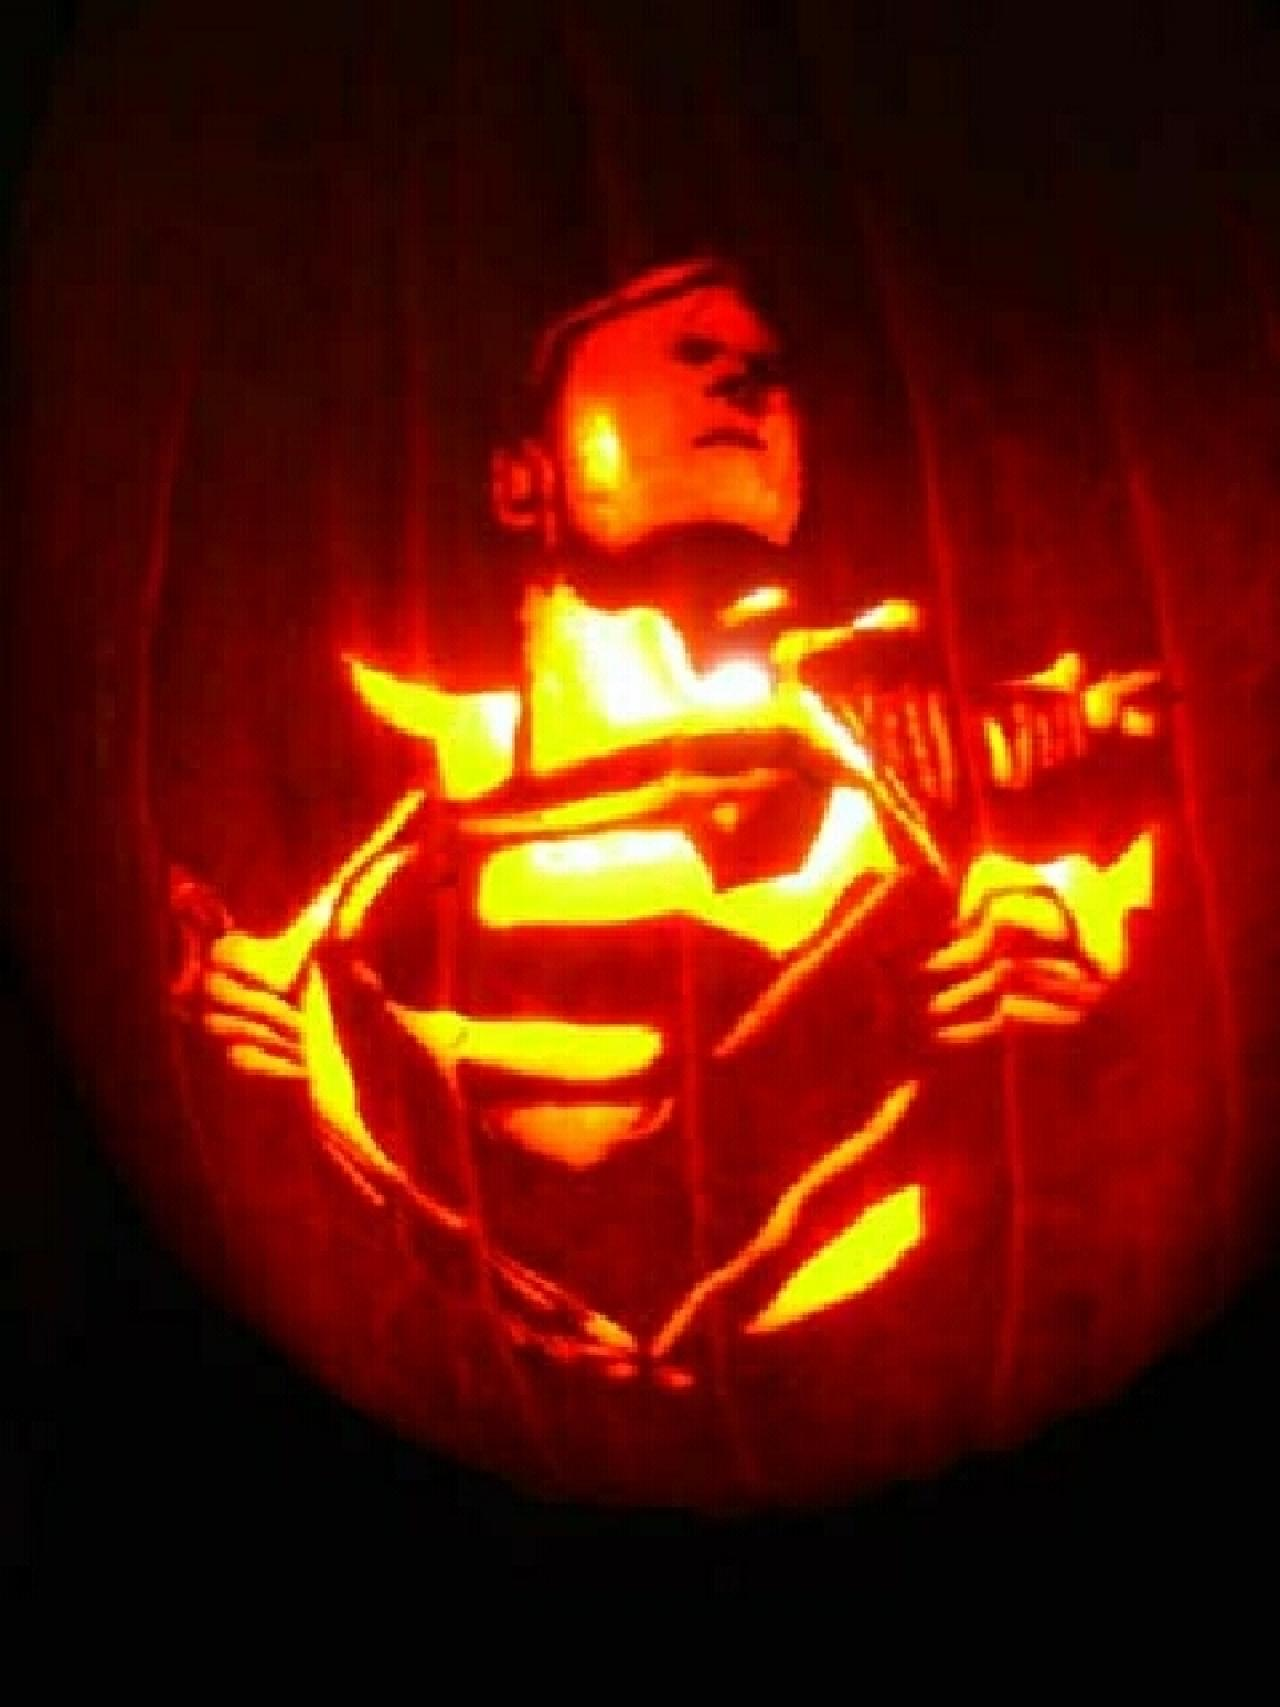 Batman iron man more superhero carved halloween